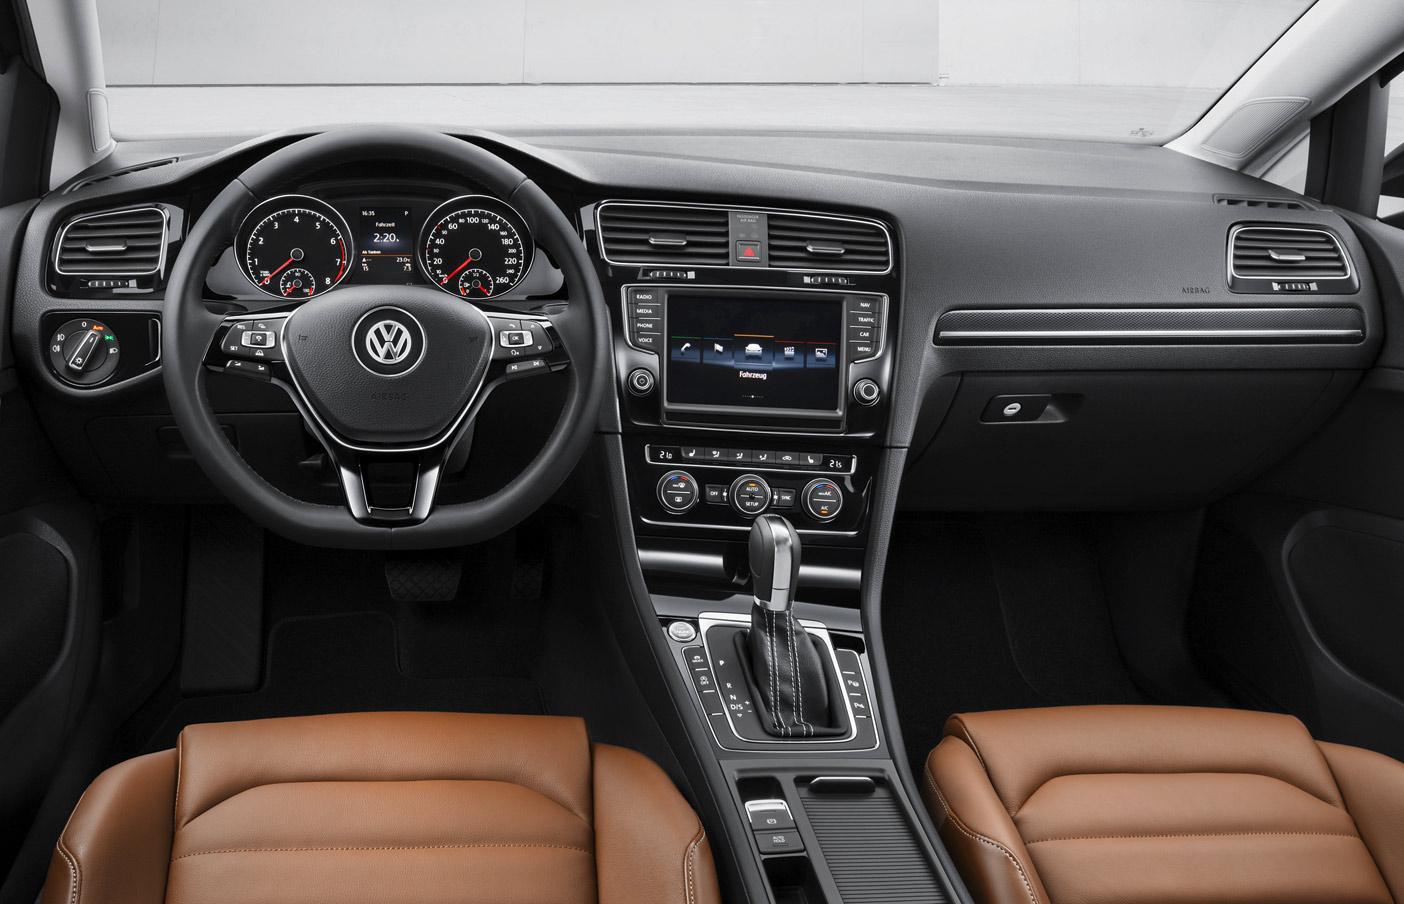 Volkswagen Golf 7 Interior 1 Vwvortex